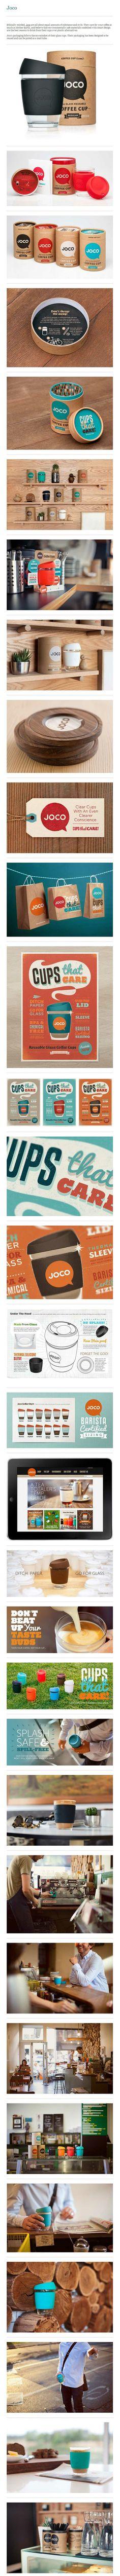 Joco coffee #packaging